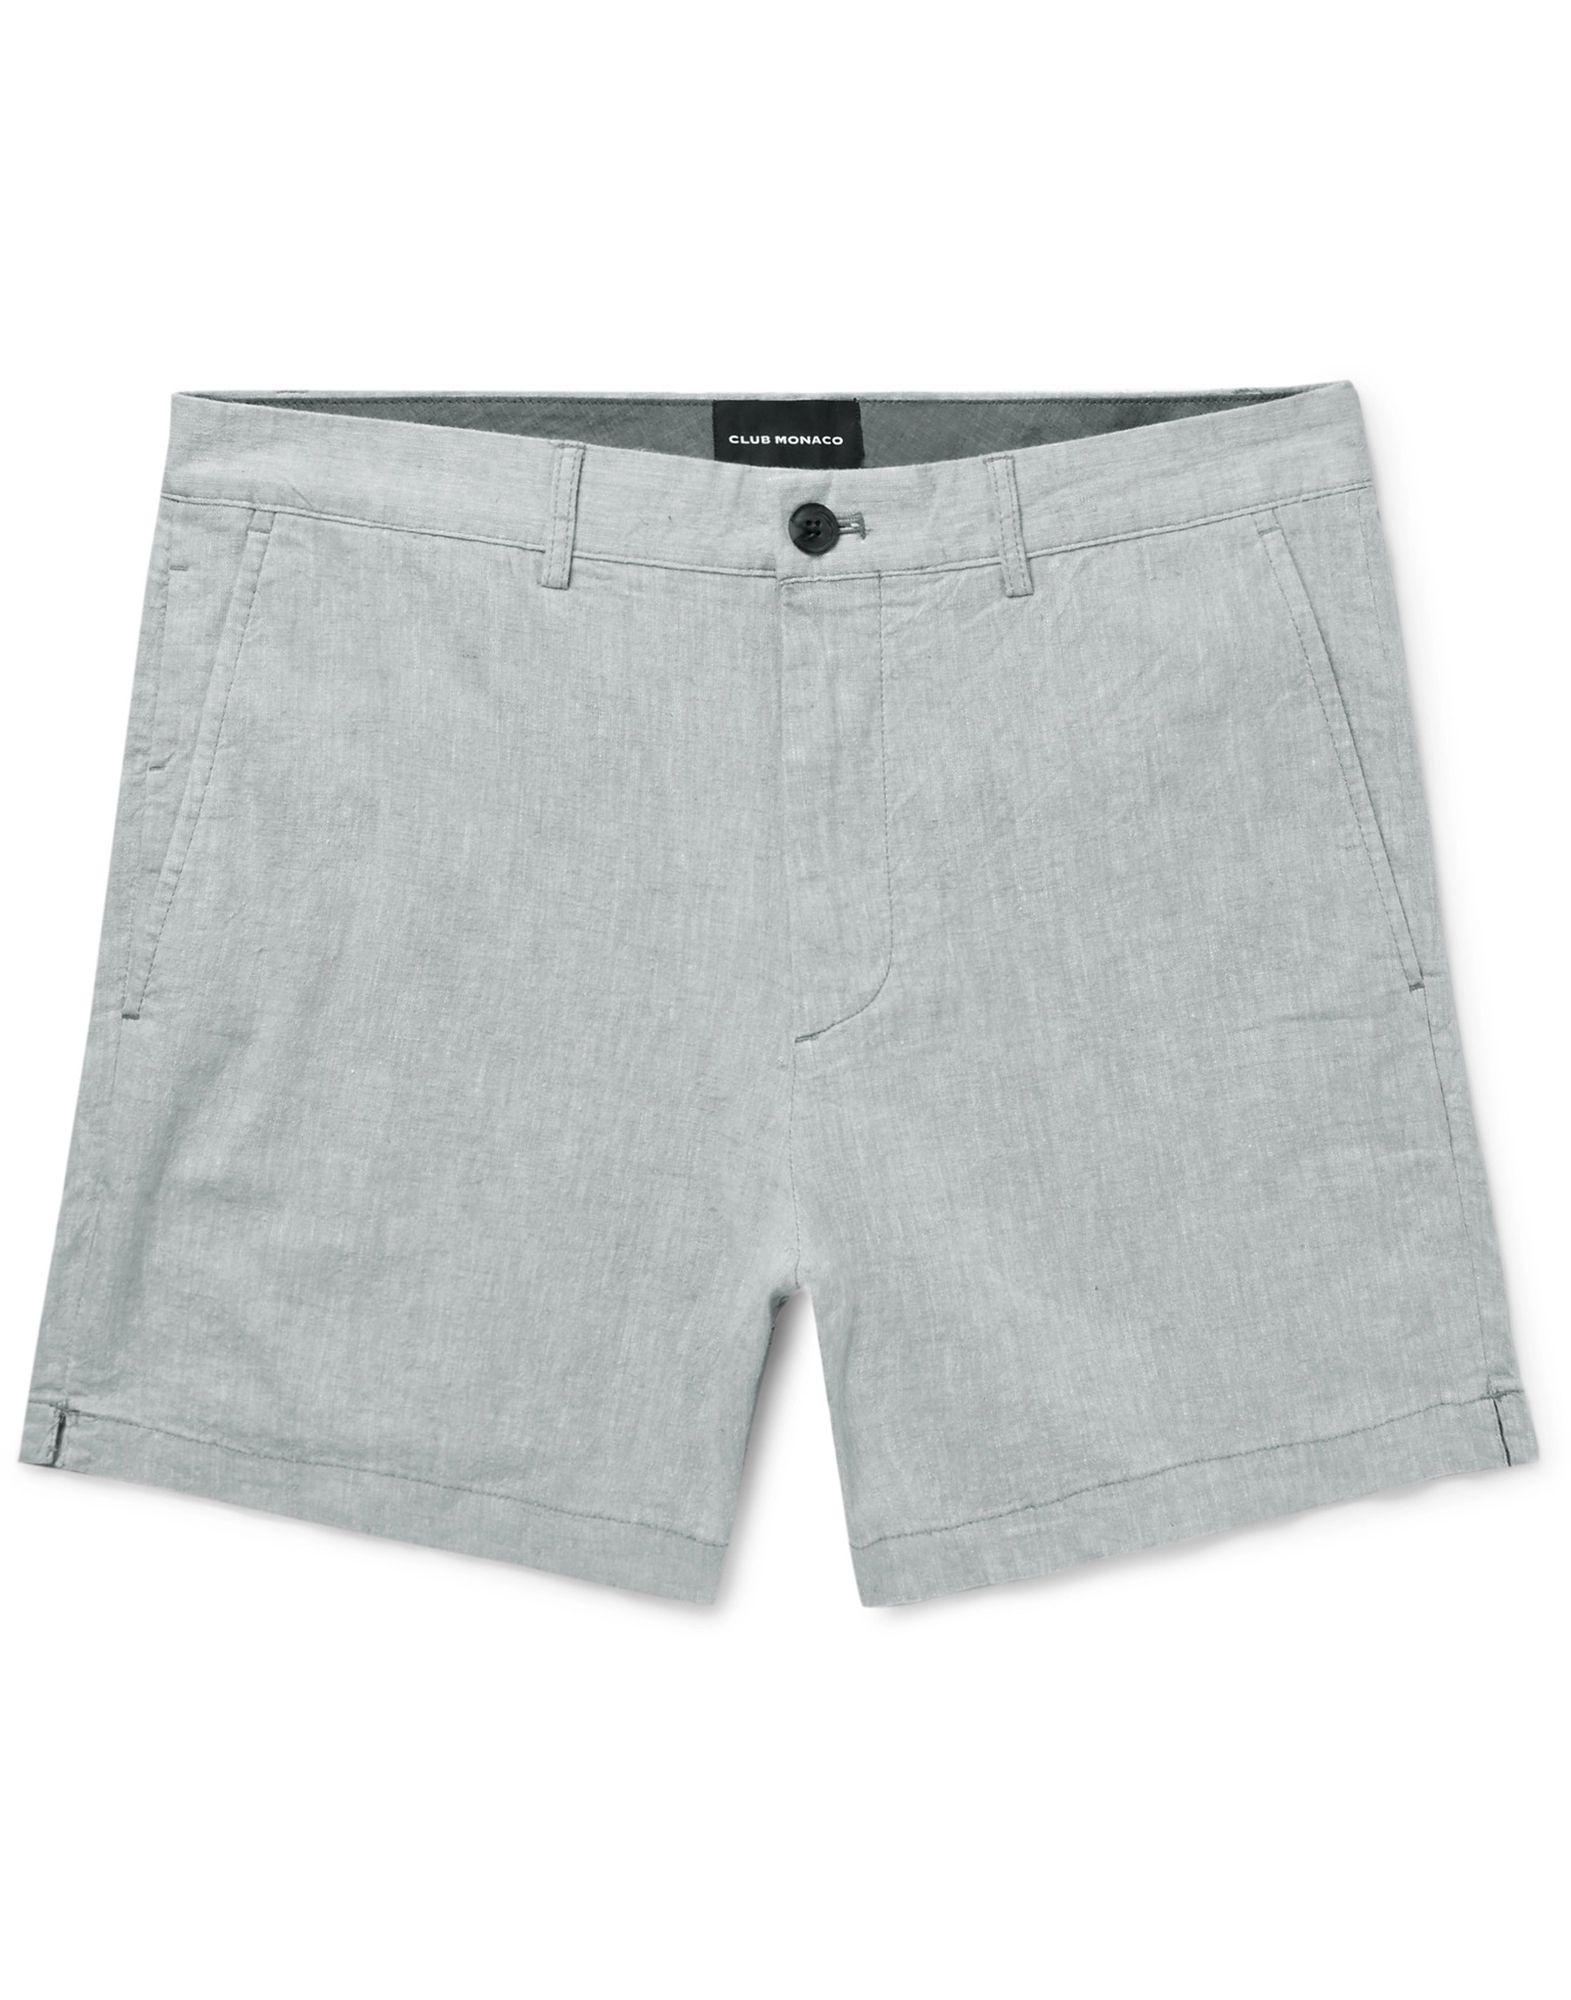 CLUB MONACO Shorts. plain weave, solid color, no appliqués, mid rise, regular fit, tapered leg, button, zip, multipockets, stretch. 54% Linen, 44% Cotton, 2% Elastane